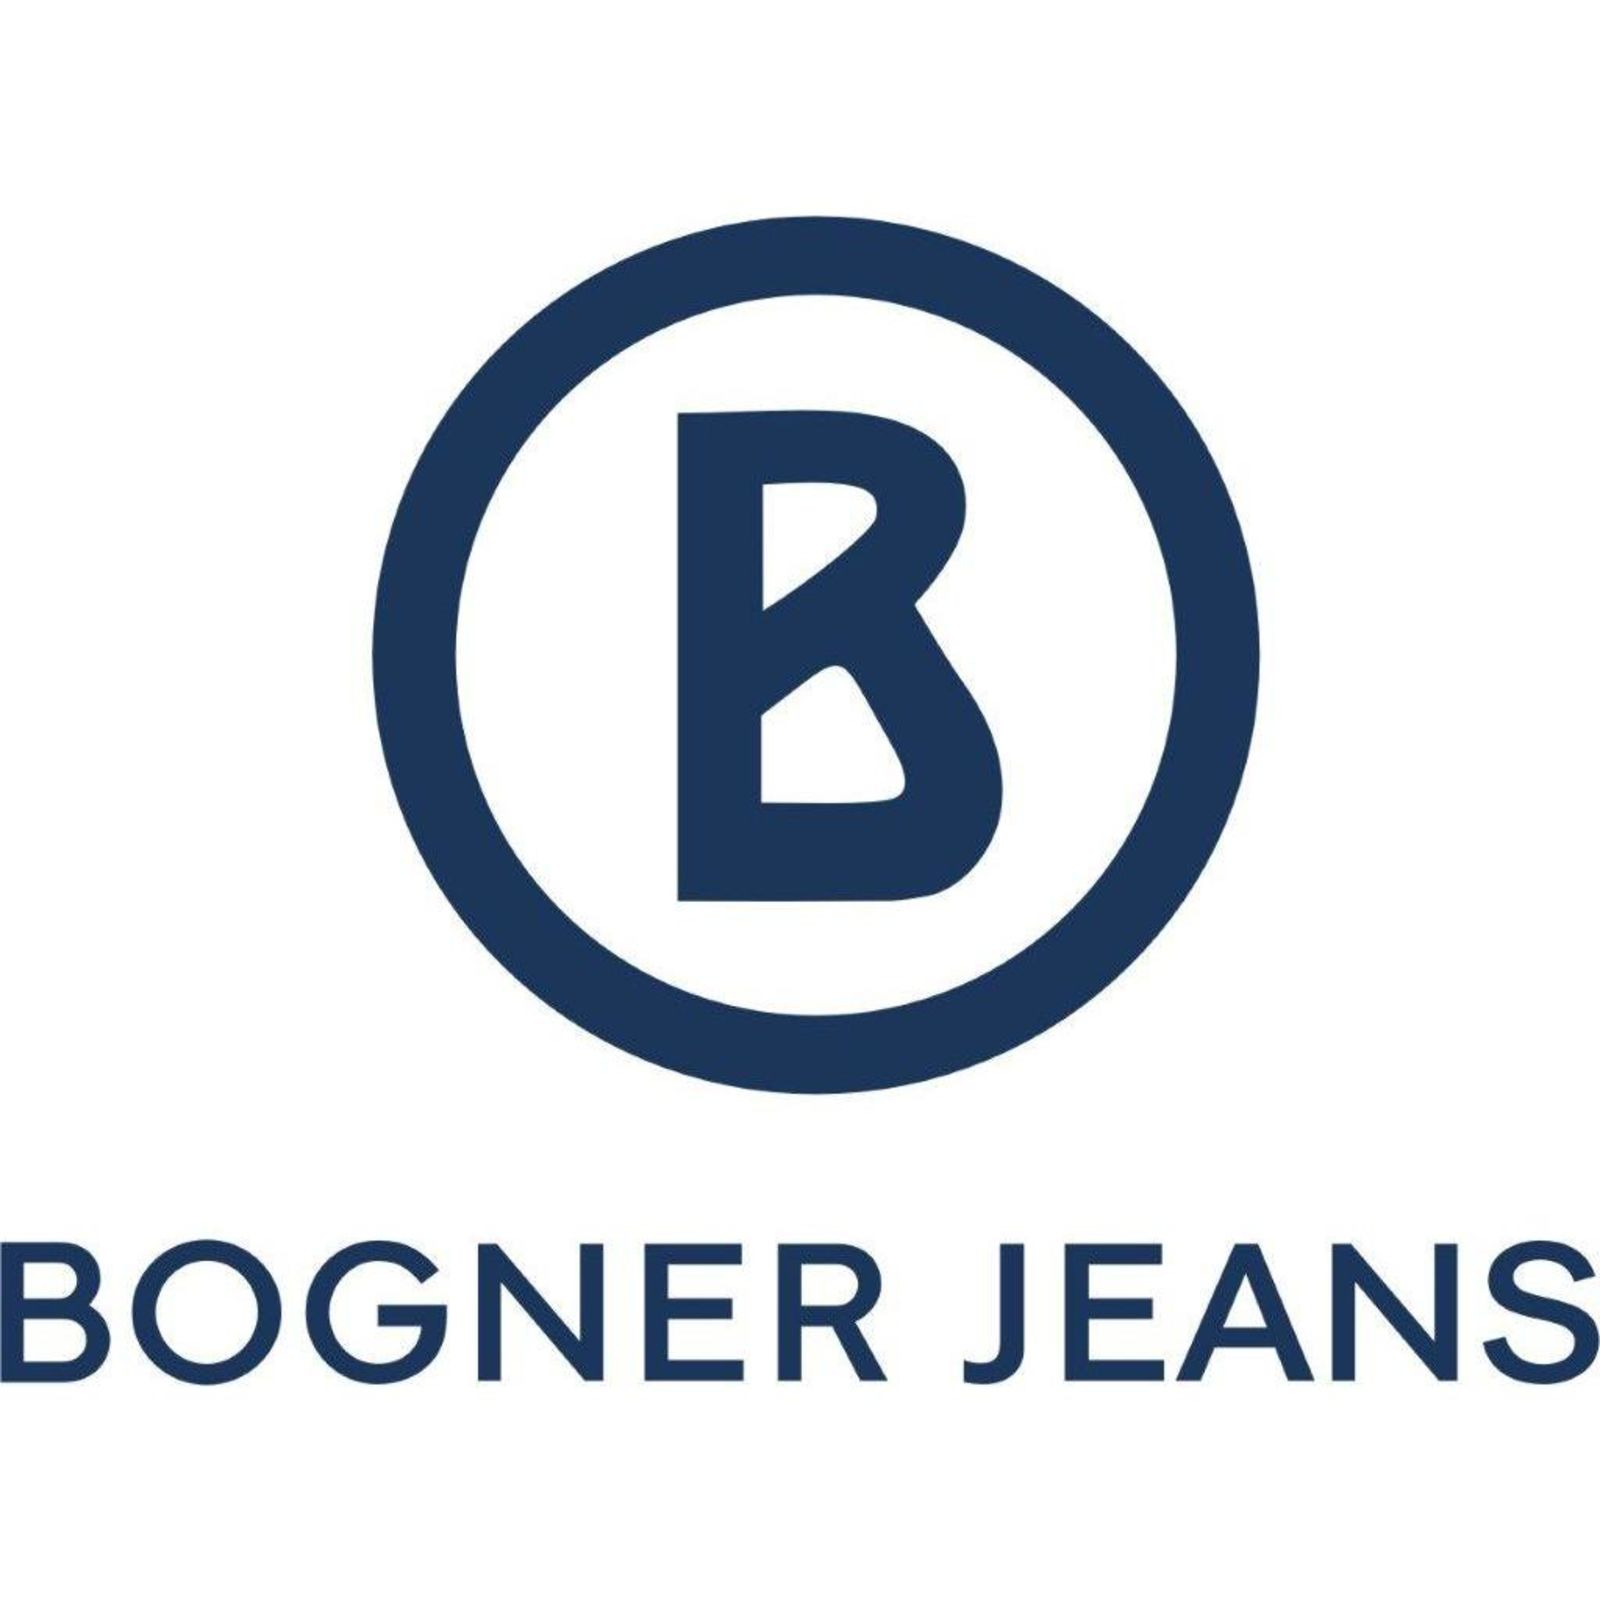 BOGNER Jeans (Bild 1)